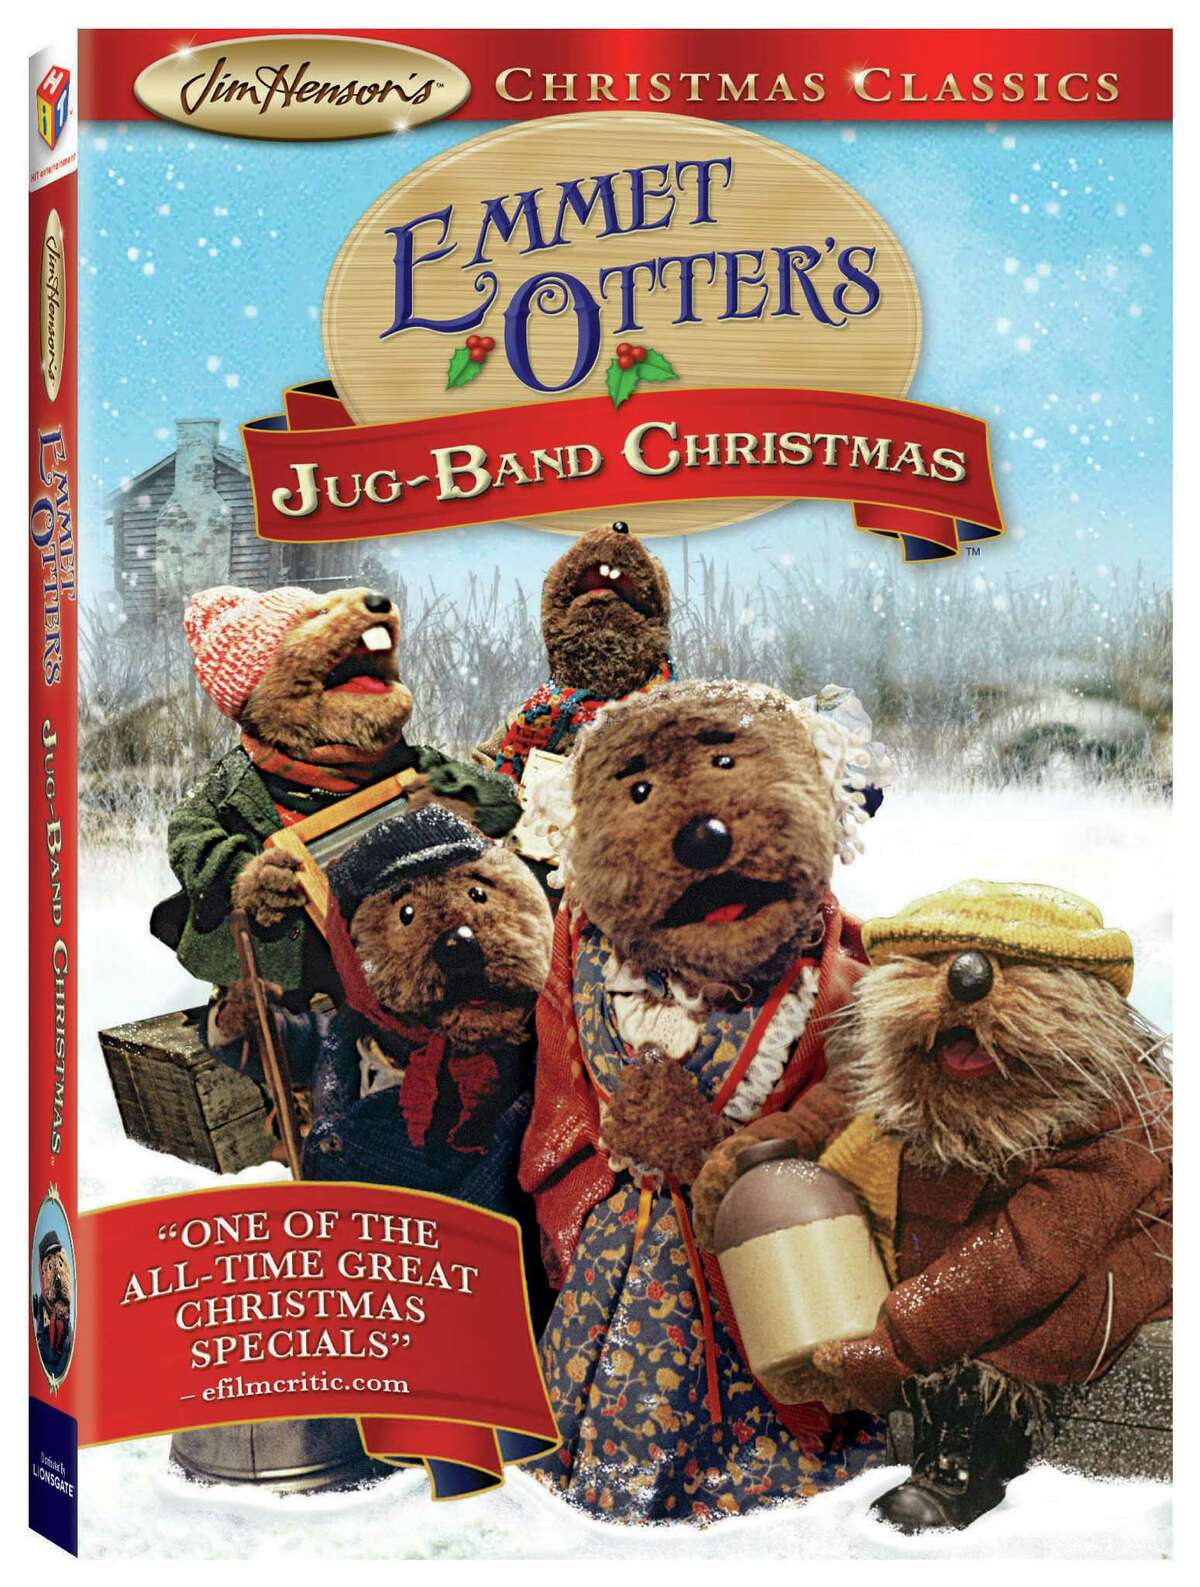 Emmet Otter's Jug-Band Christmas DVD package